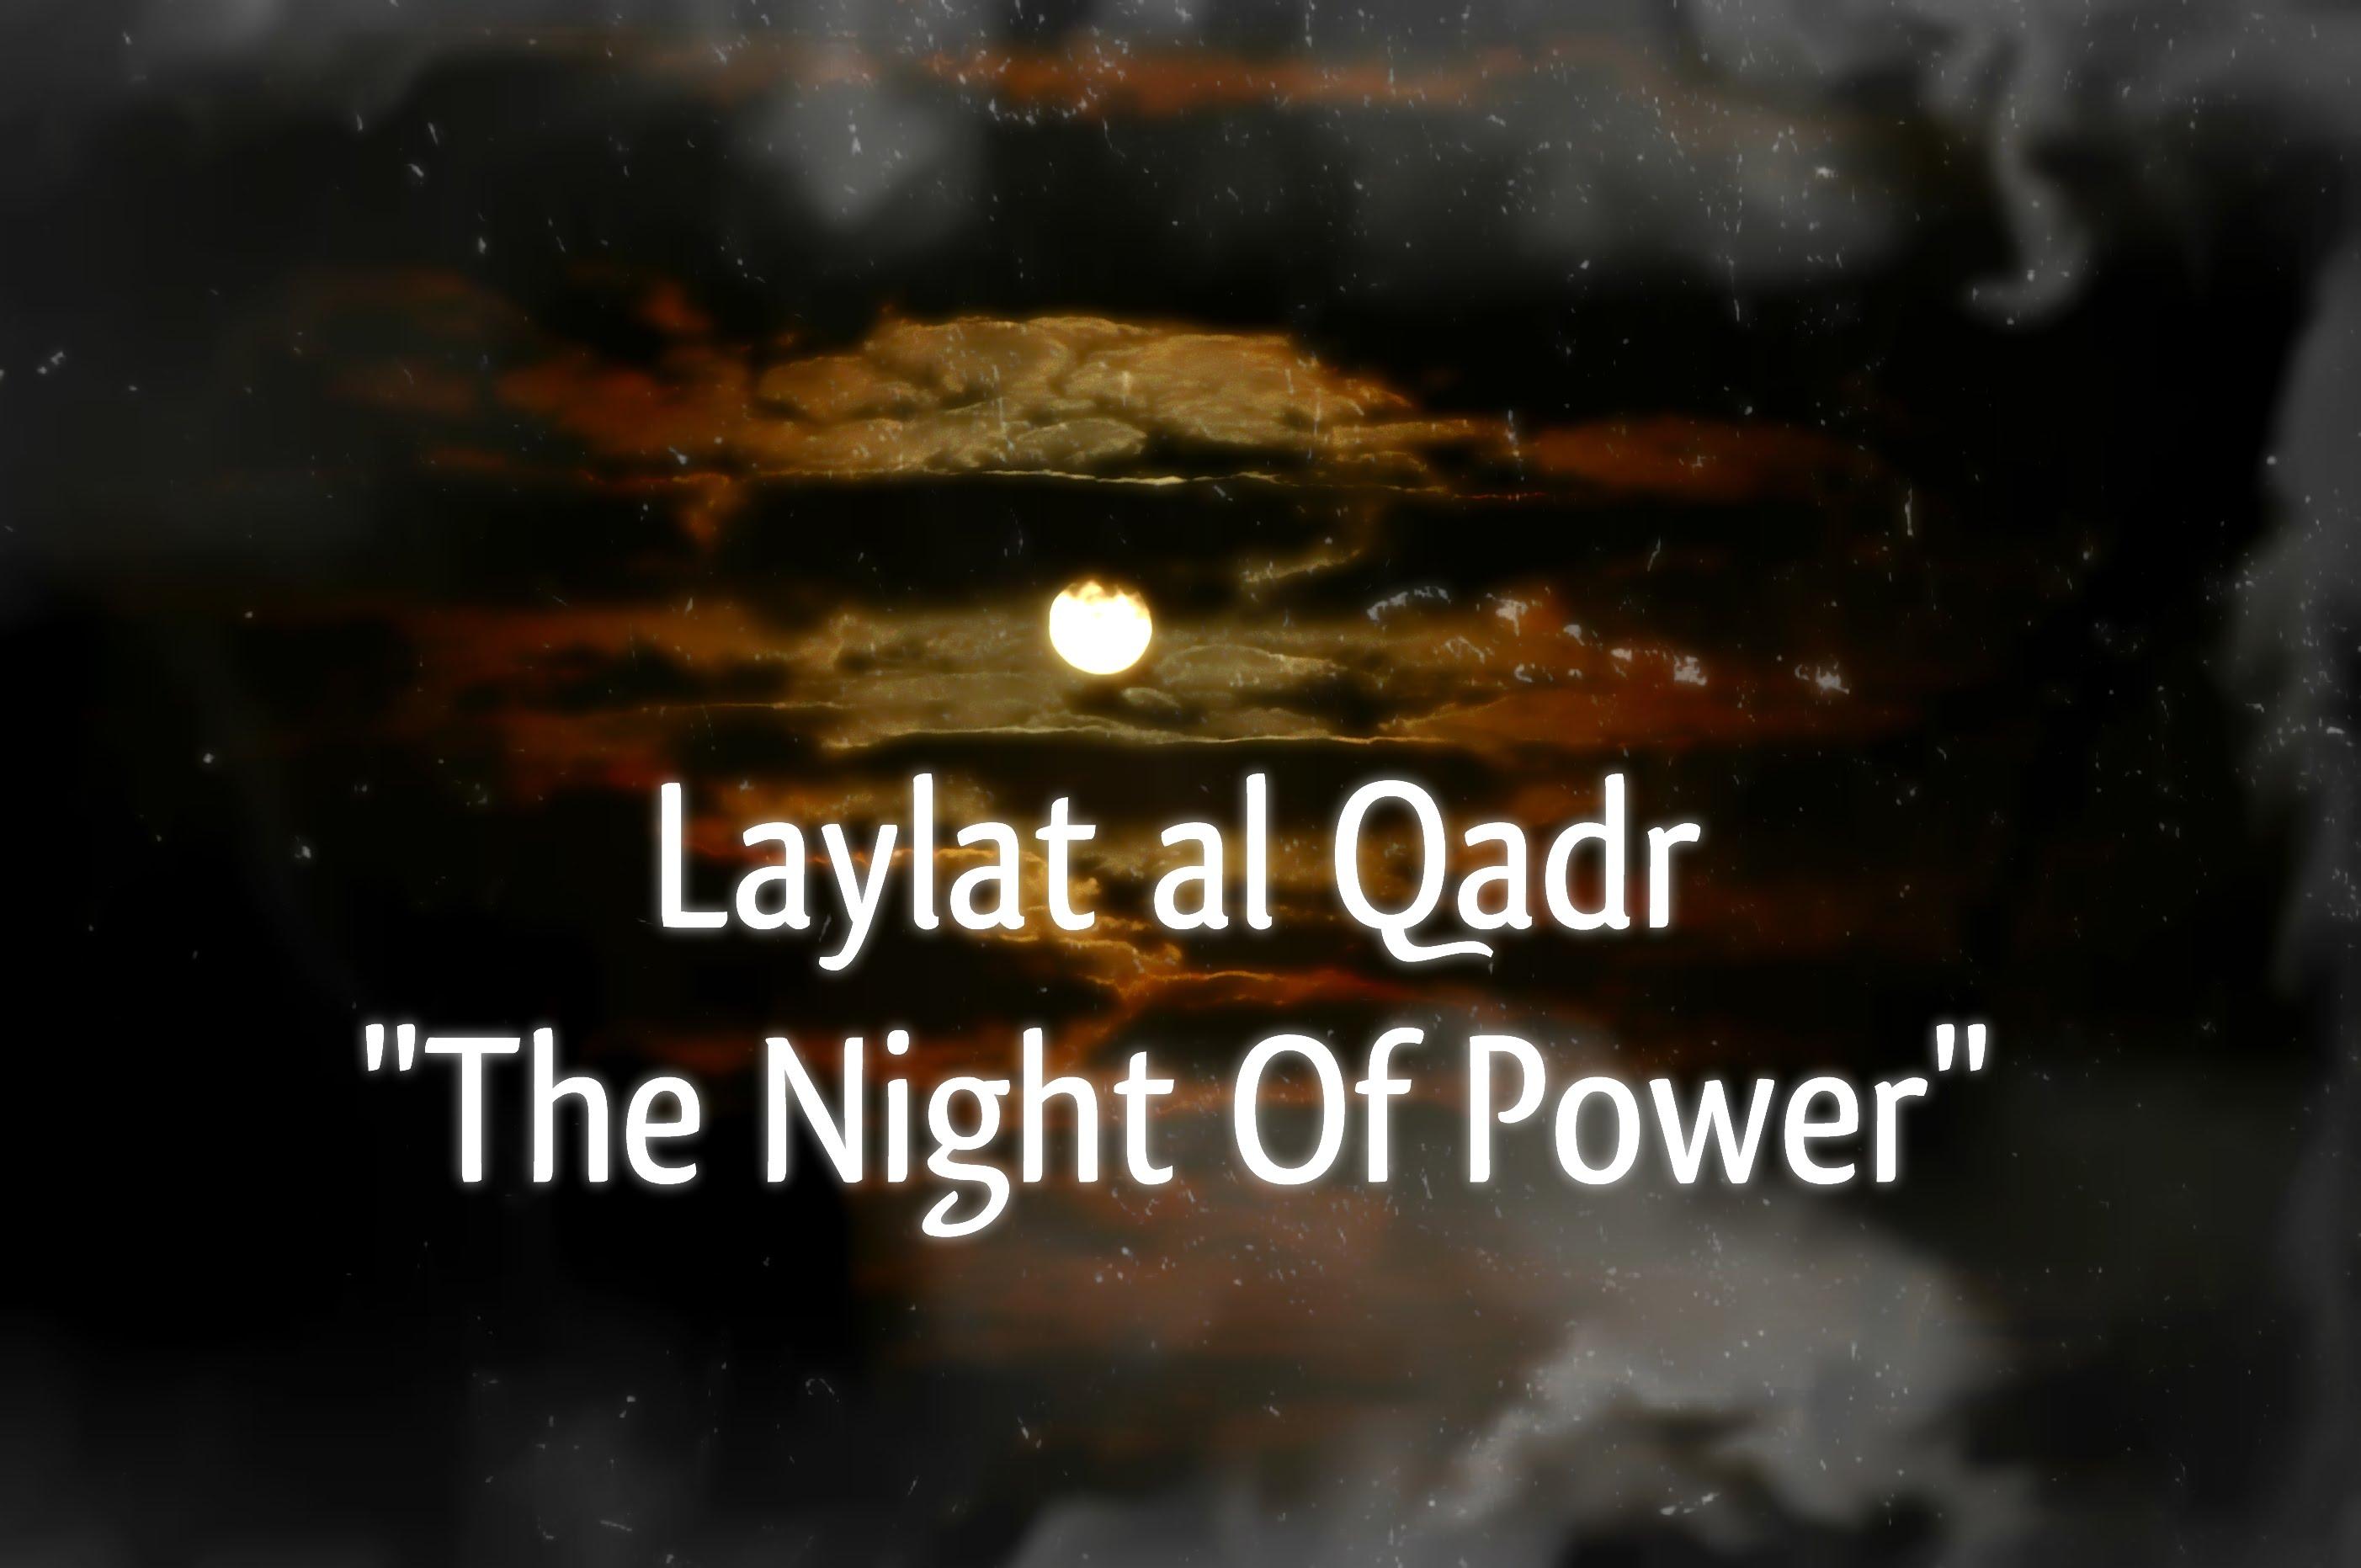 excellence of laylat al qadr - Laylat al-Qadr